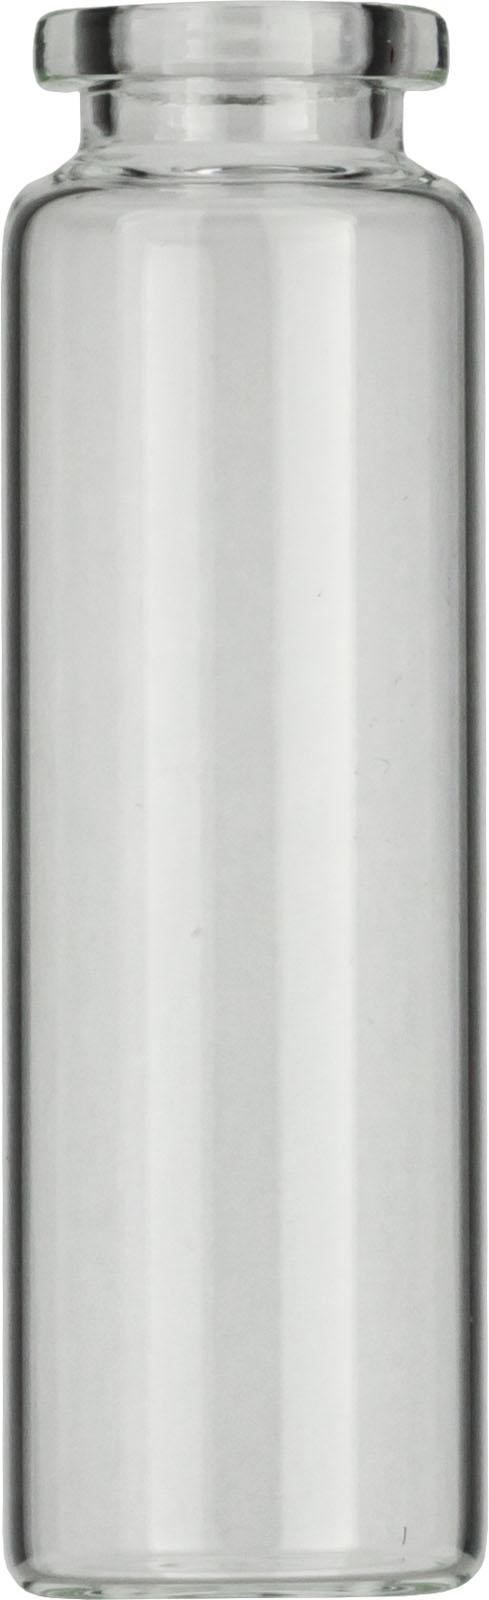 Vial N20-20, RR, k, 23,25x75,5, fl., DIN